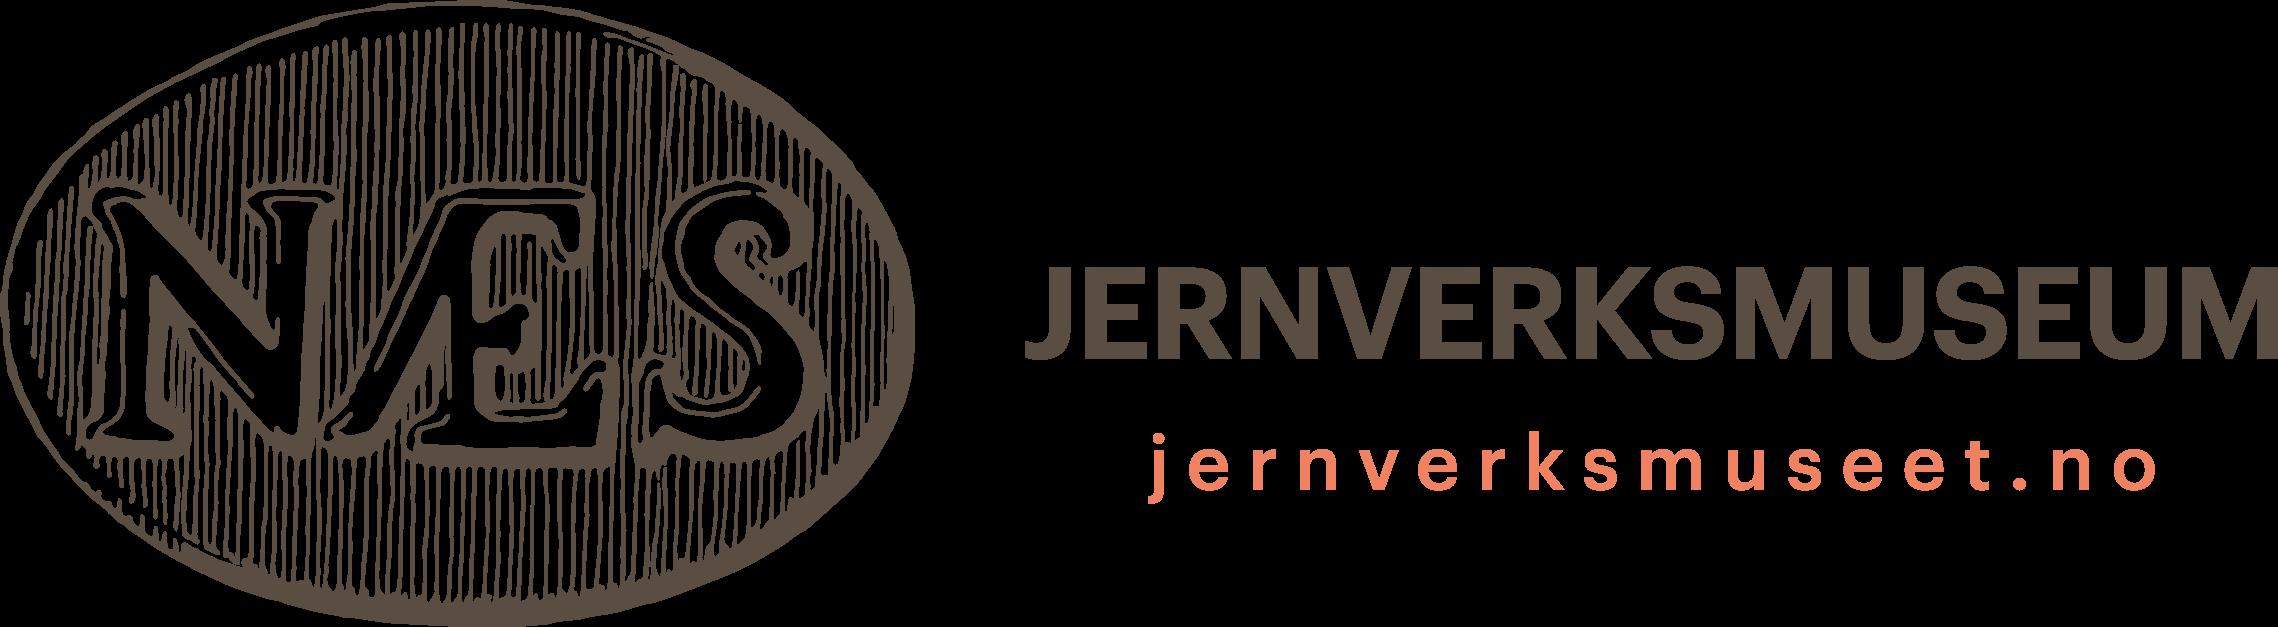 Logo for Stiftelsen Næs jernverksmuseum